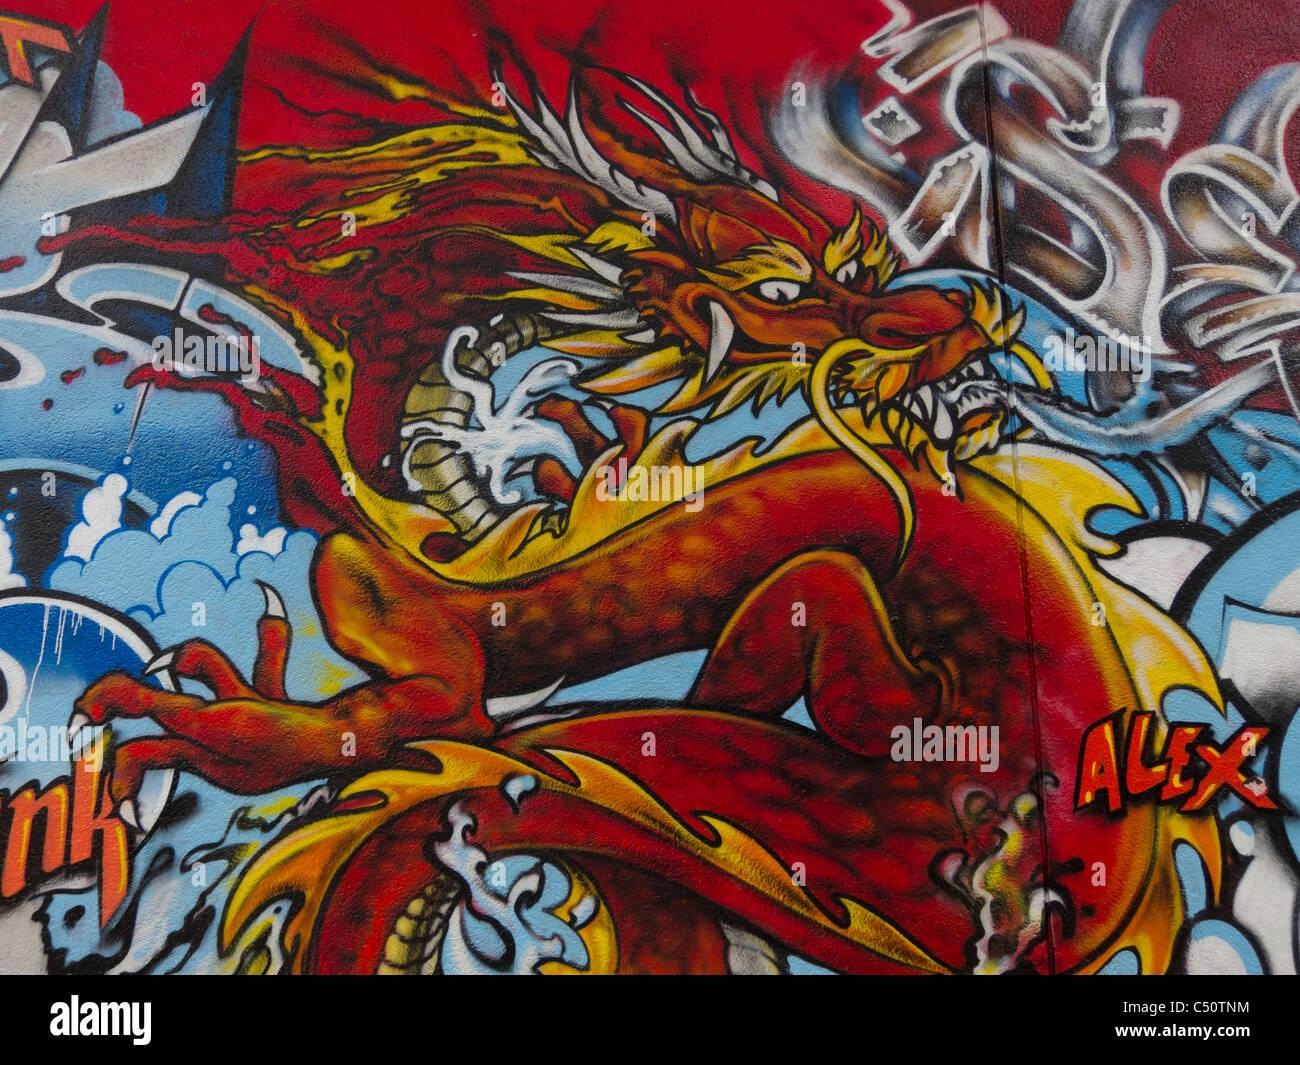 Paint Spray Red Dragon